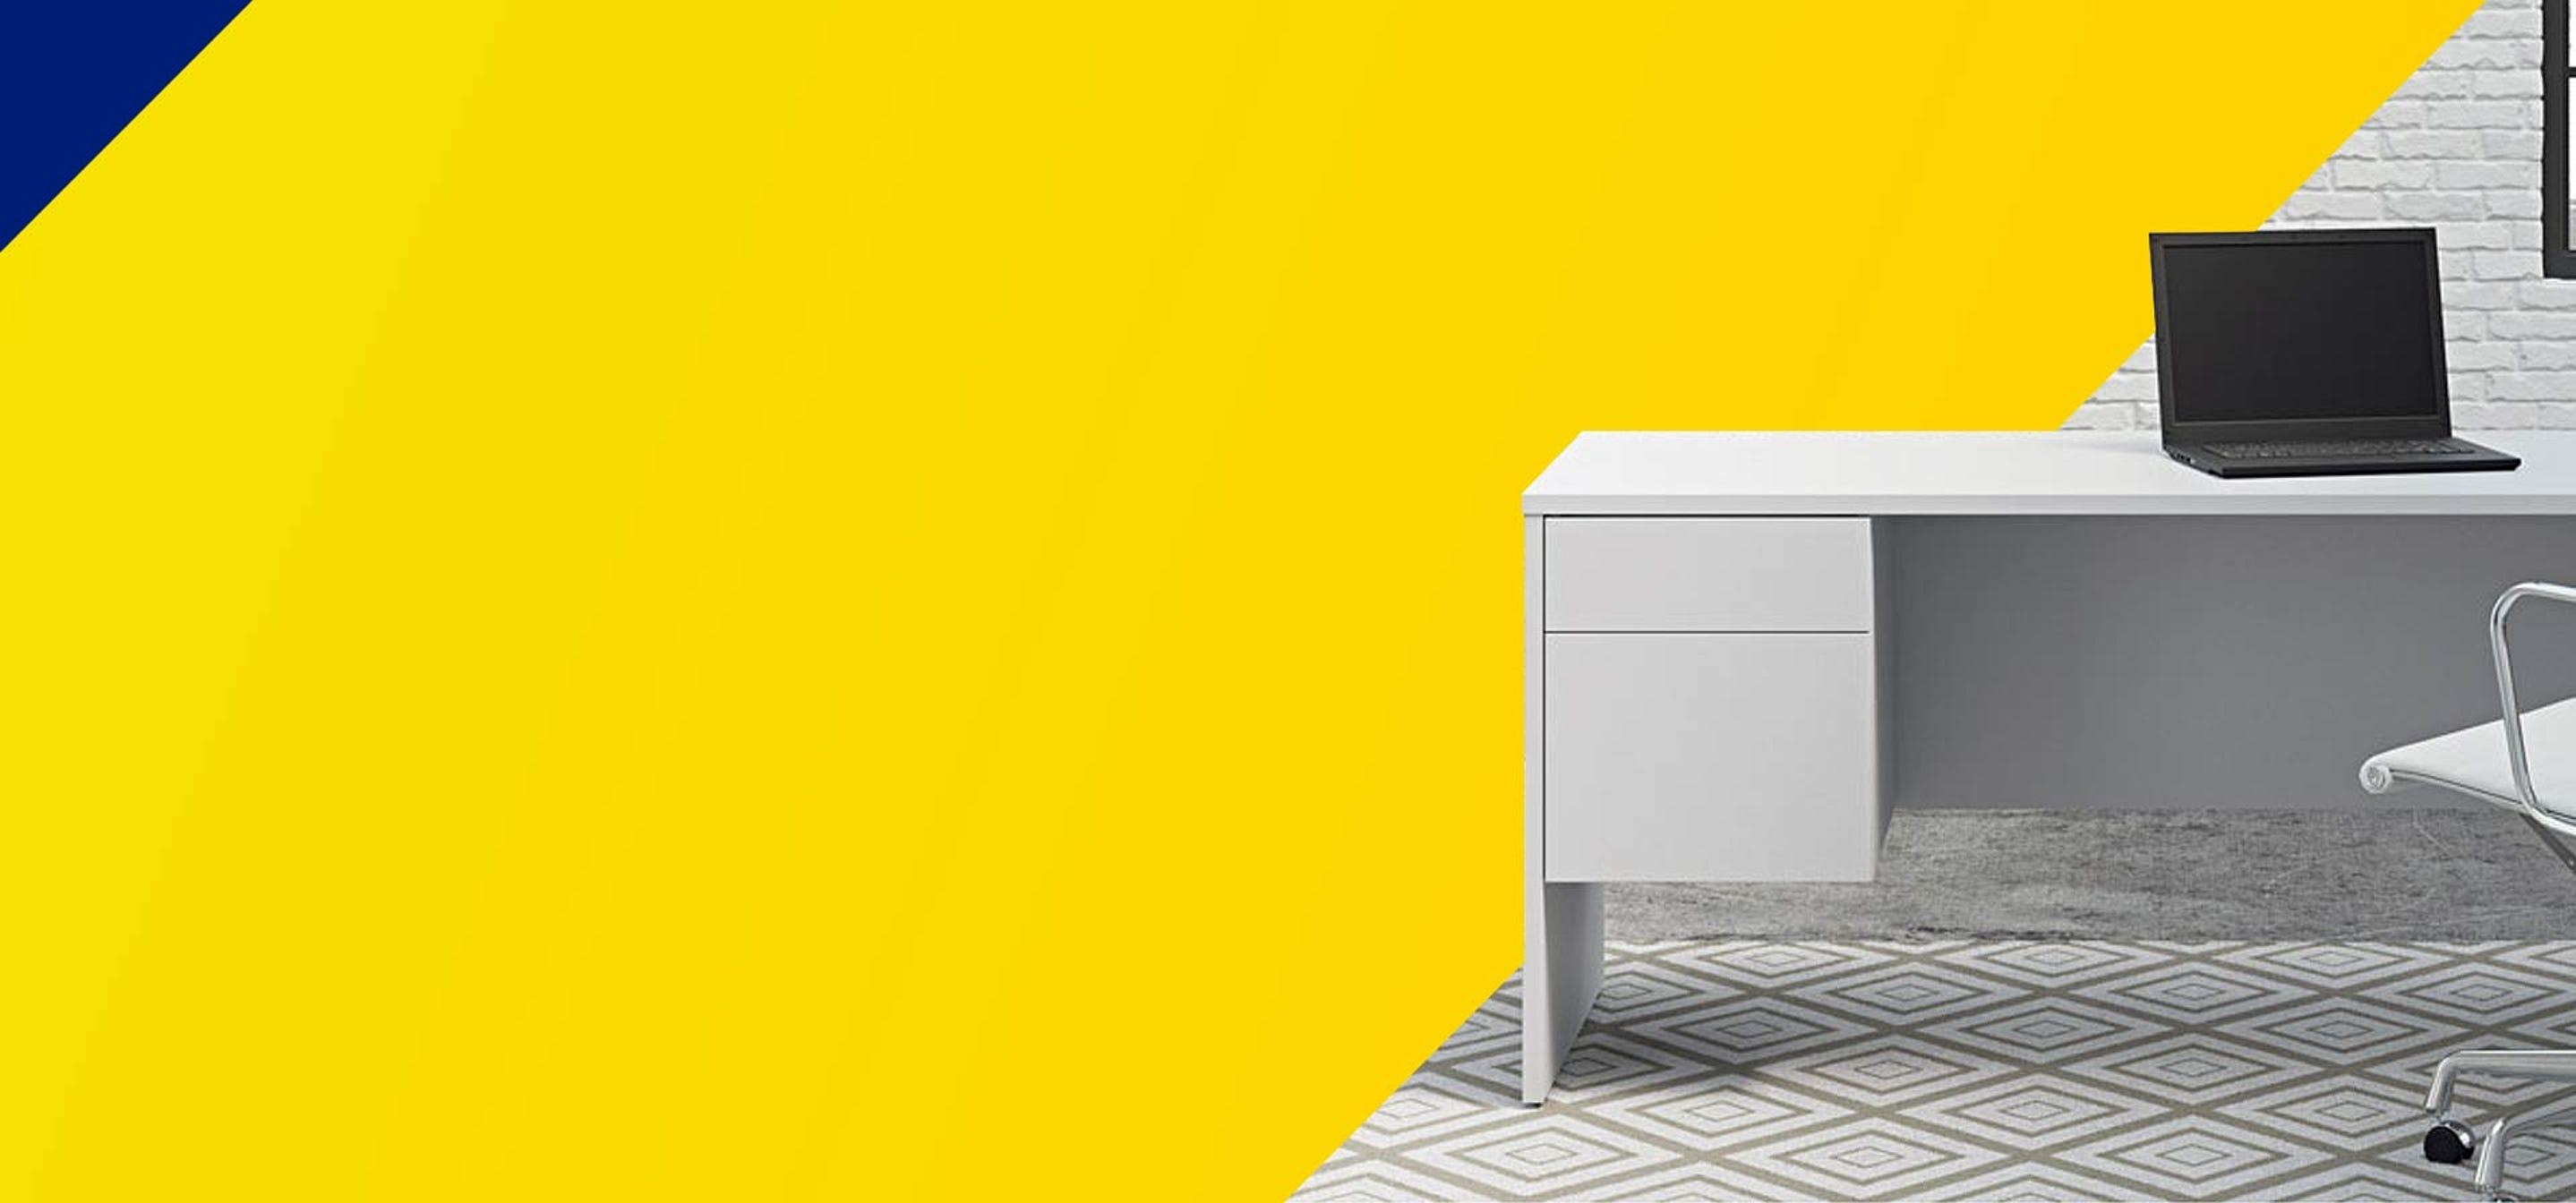 Phenomenal Office Furniture Best Buy Canada Download Free Architecture Designs Scobabritishbridgeorg